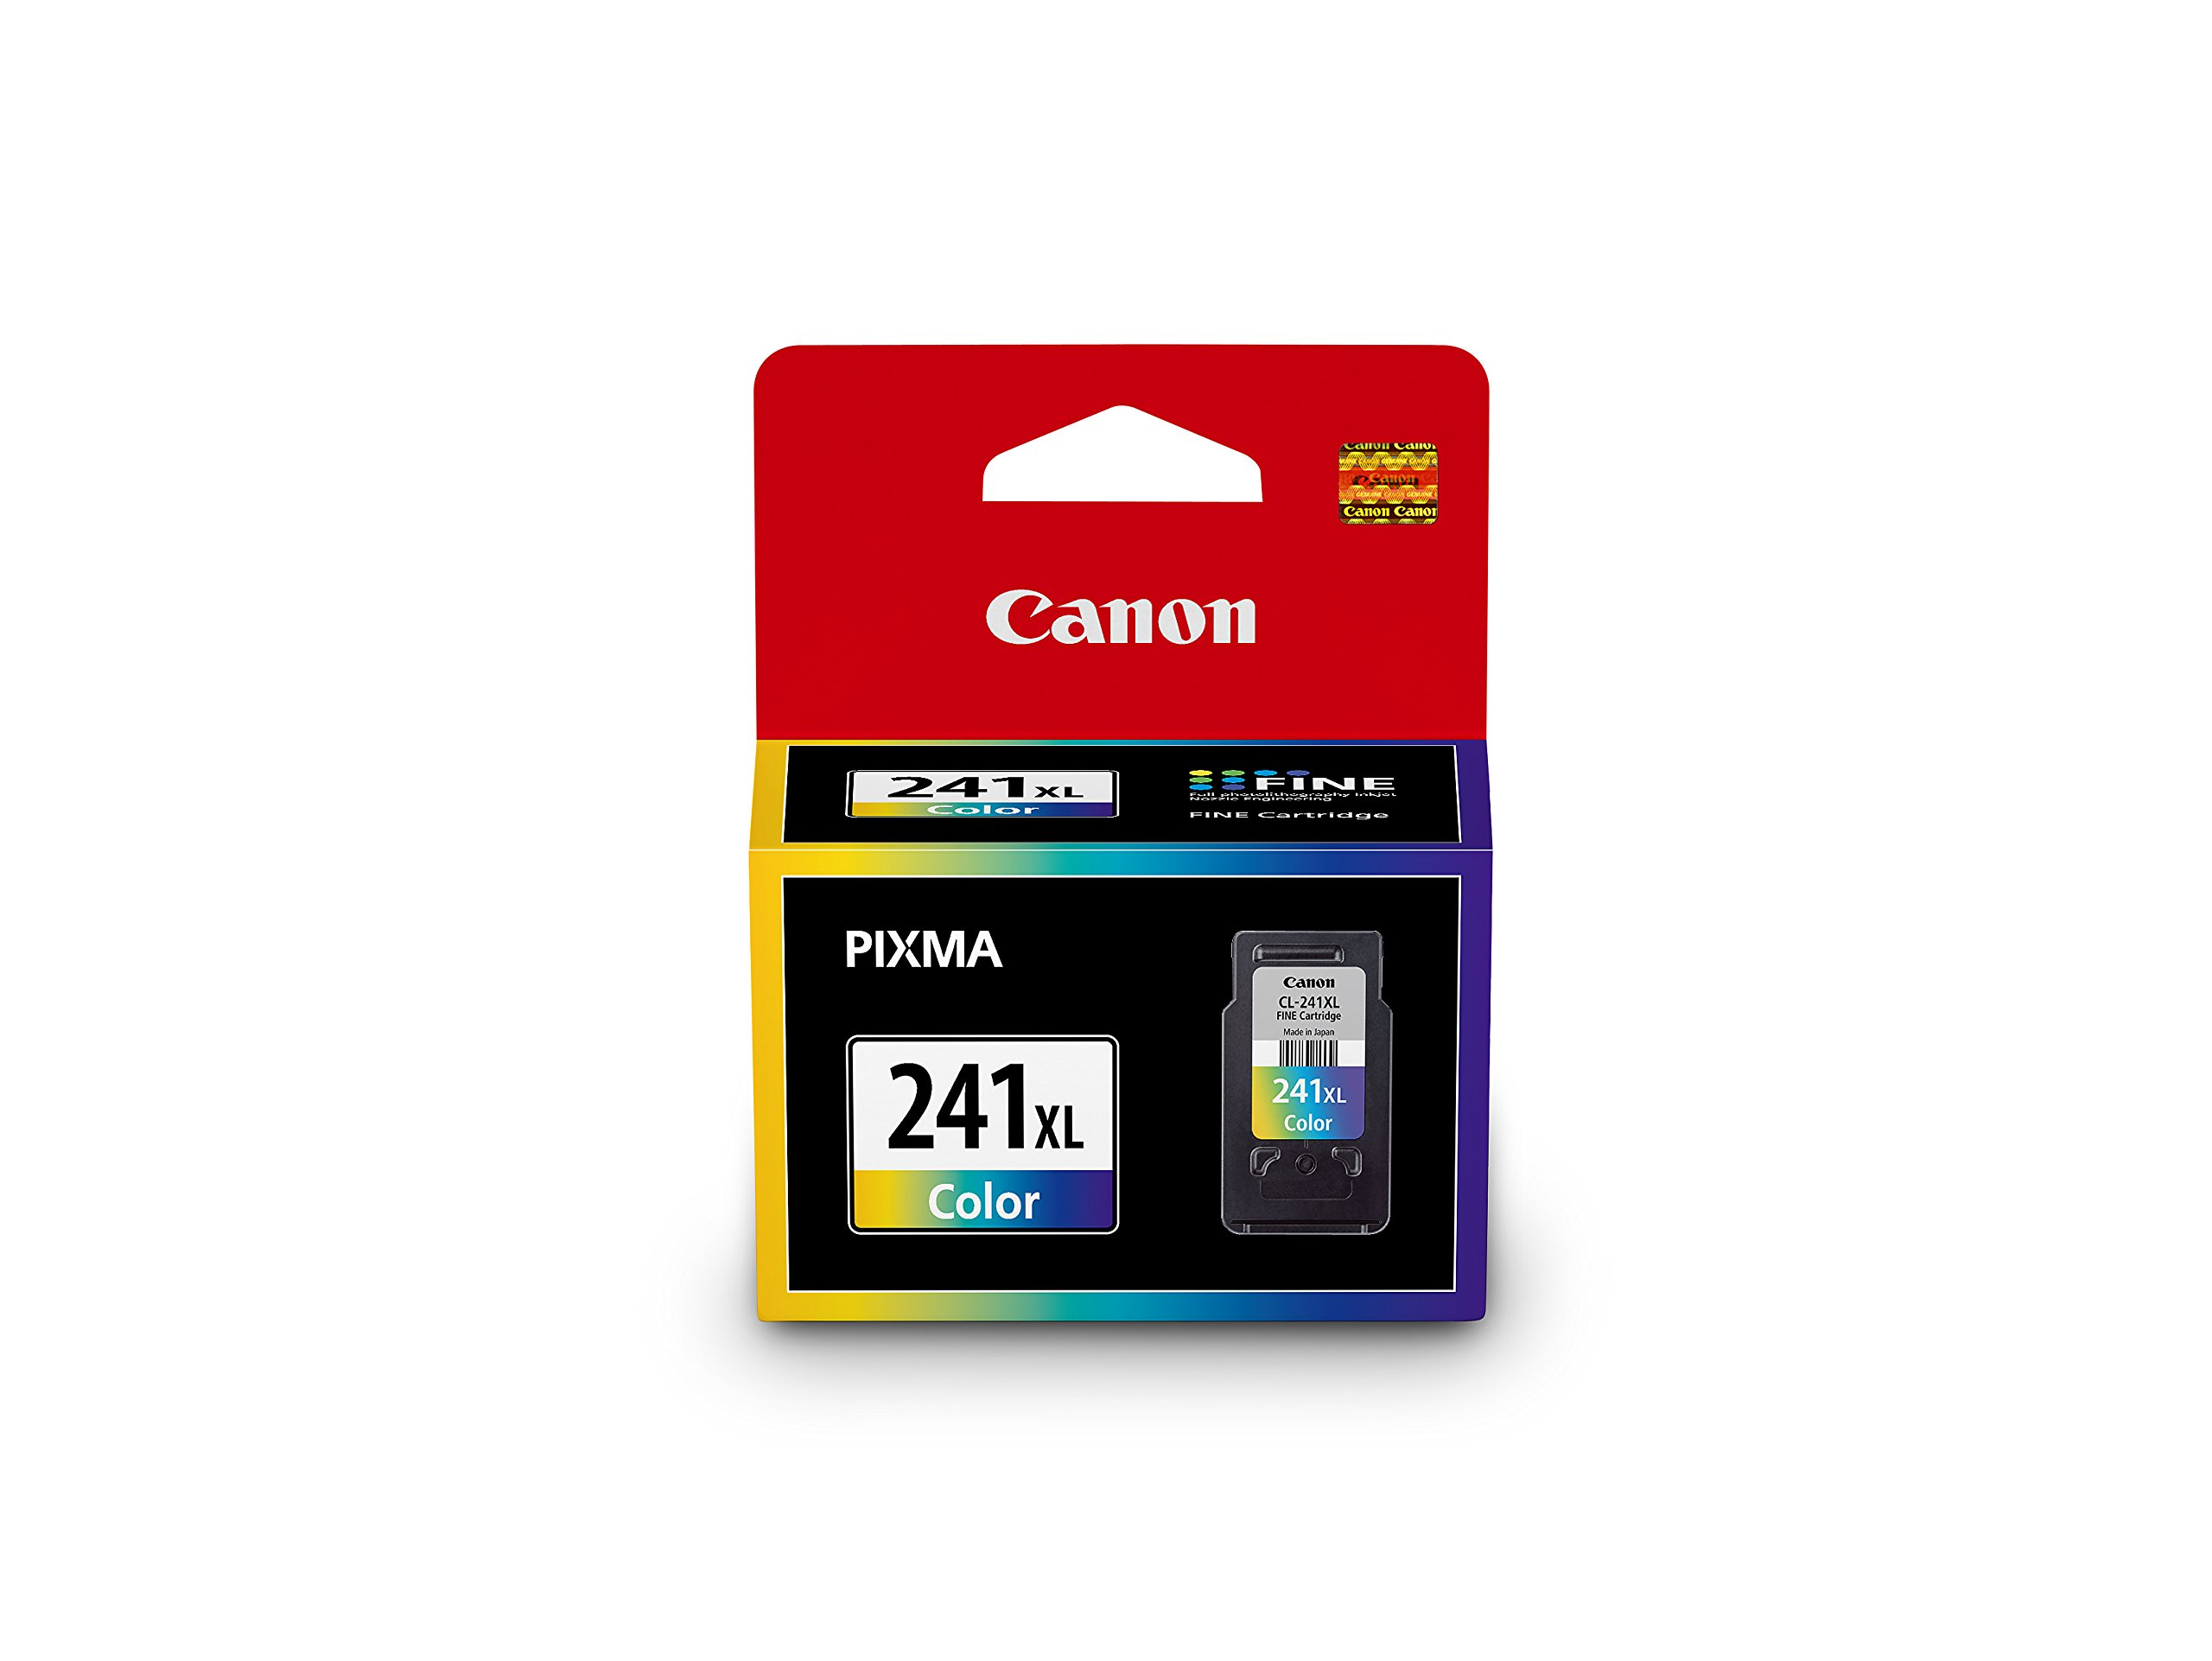 Canon CL-241XL Color Ink Cartridge, Compatible to MG3620,MG3520,MG4220,MG3220,MG2220, MG4120,MG3120 and MG2120